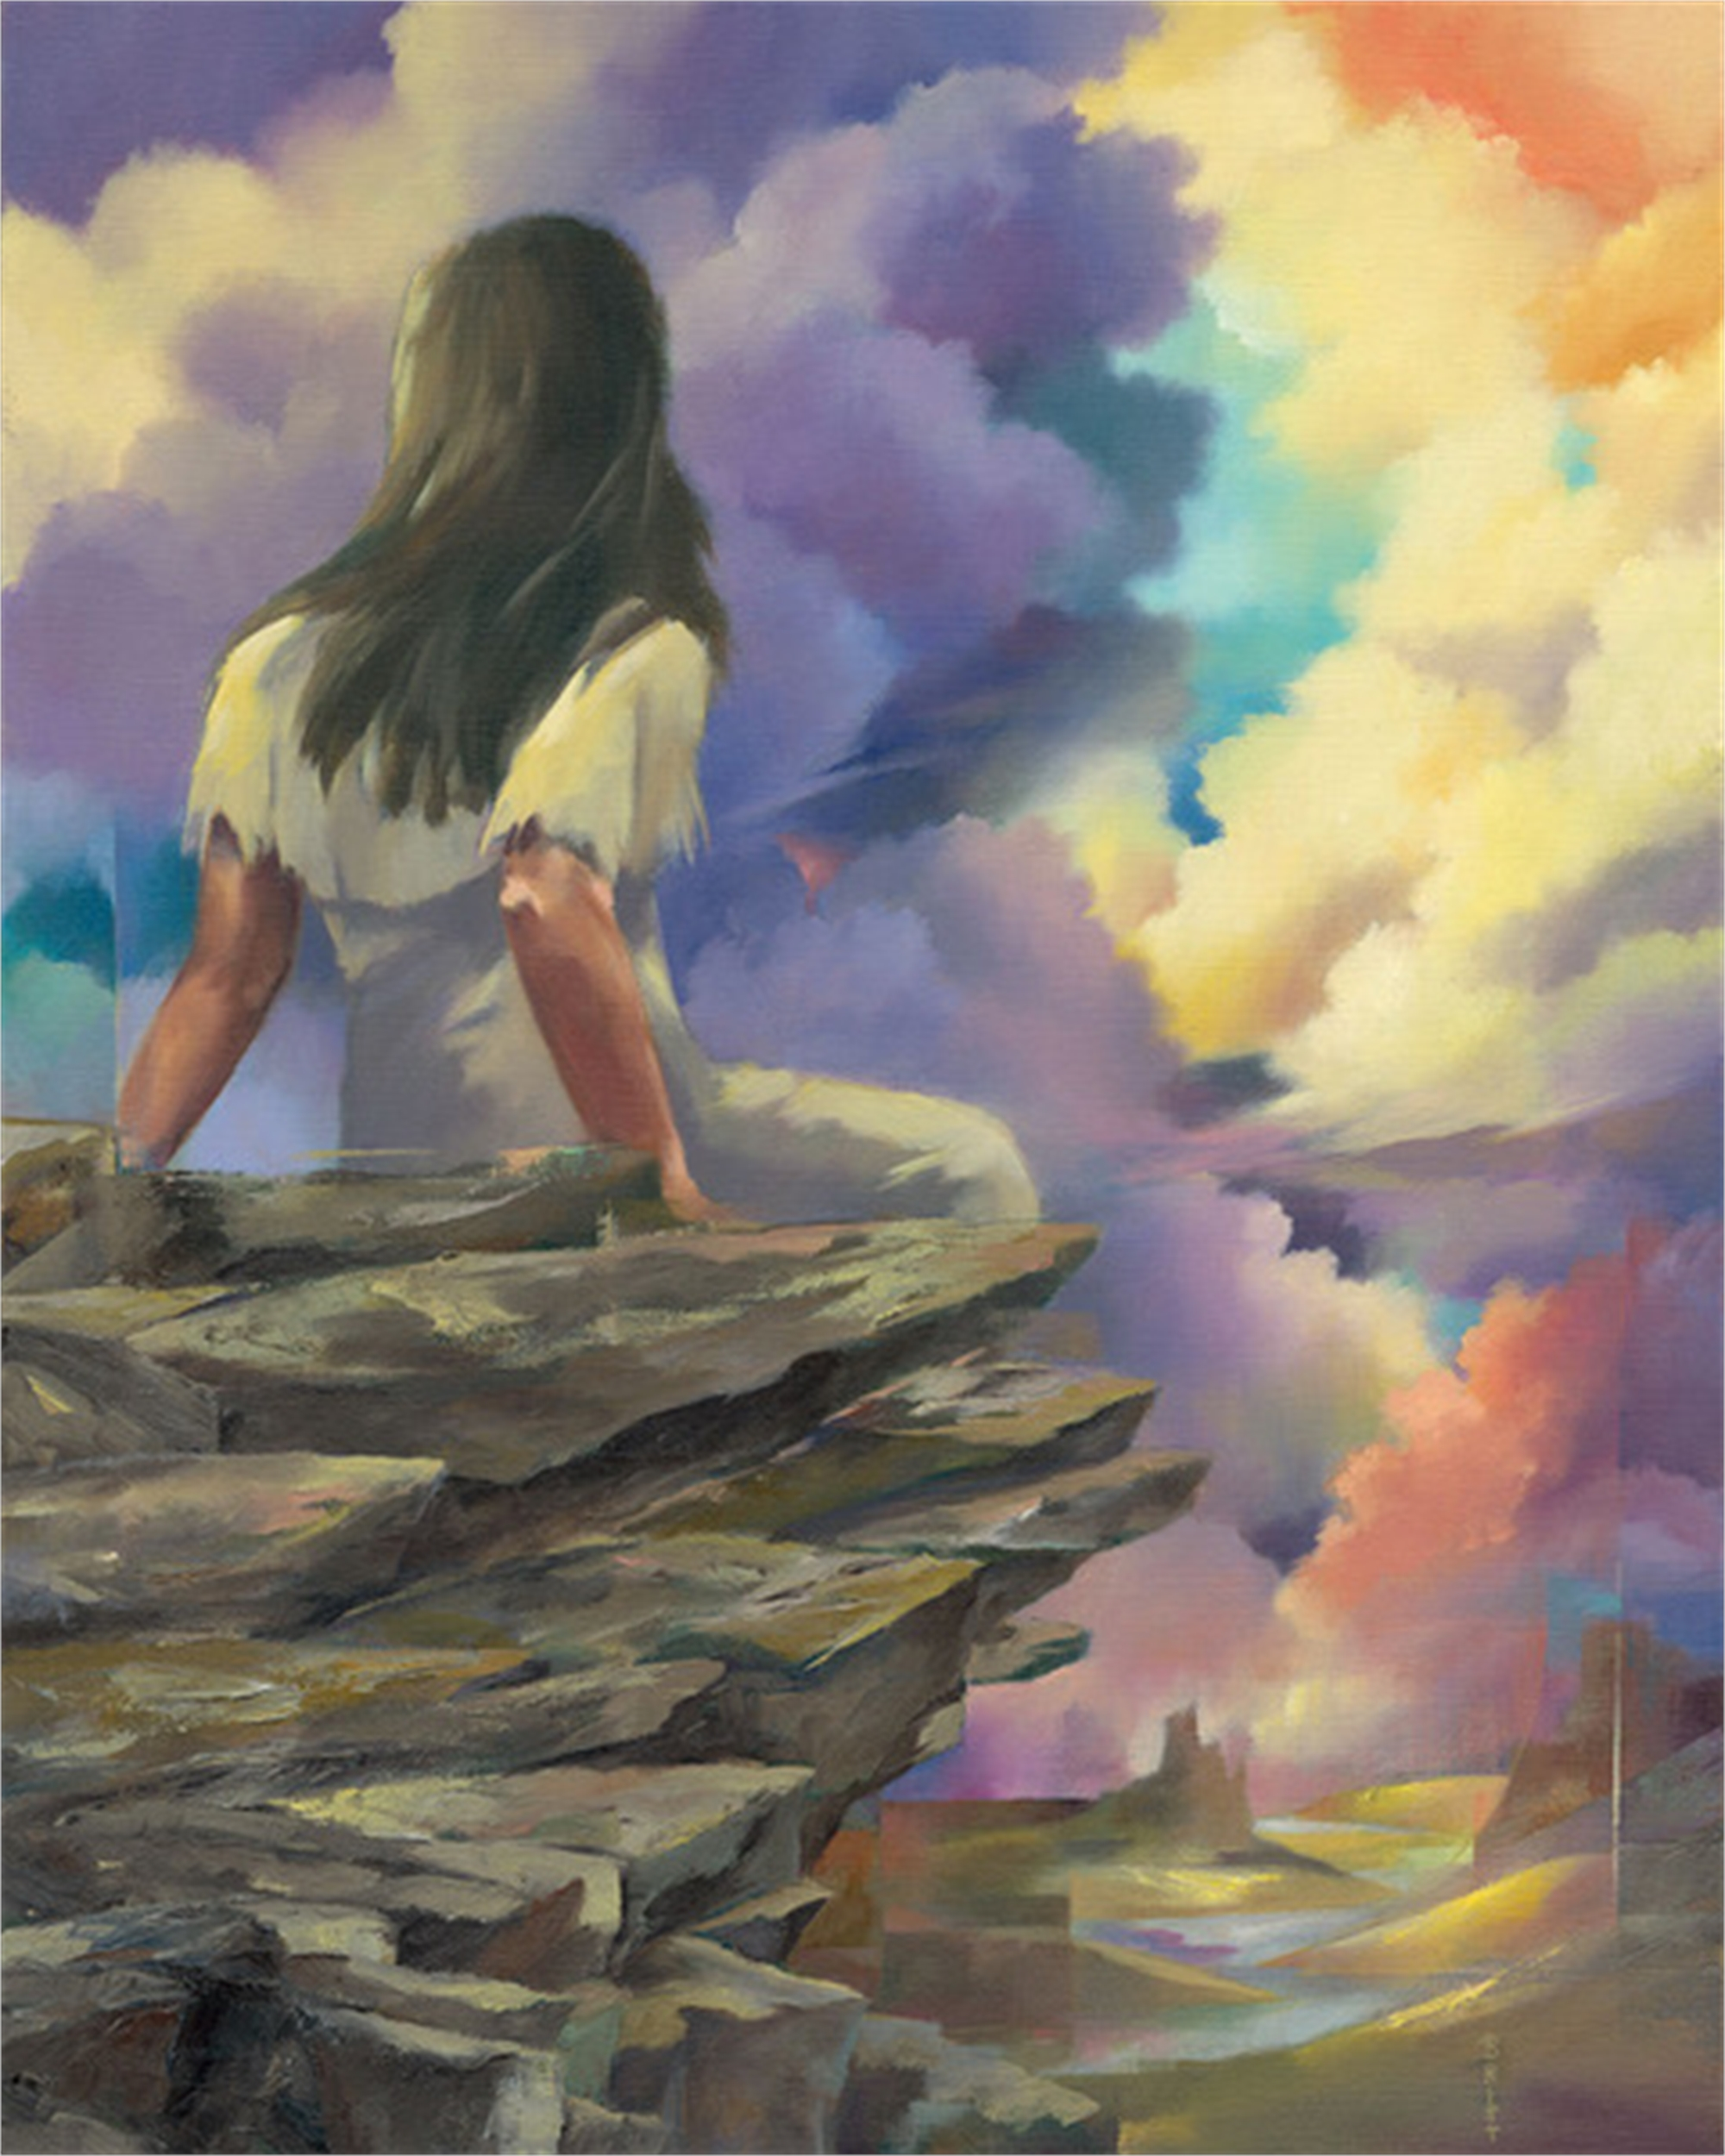 Dreamscape by Stephanie Britt